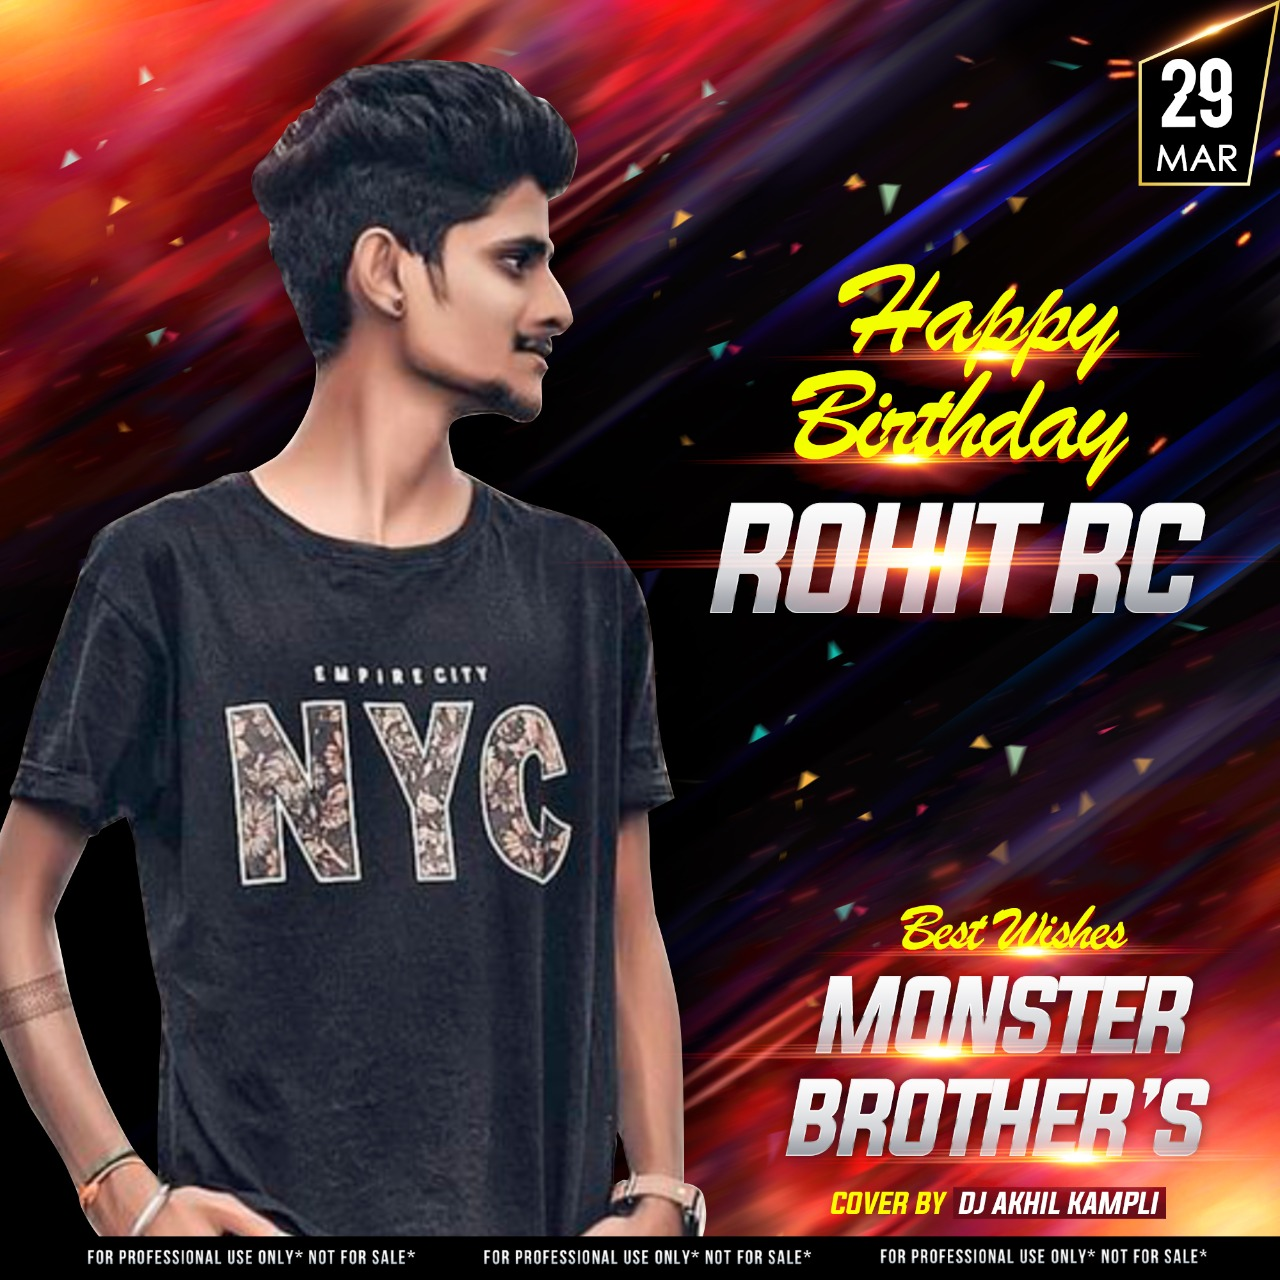 DJ ROHIT RC BIRTHADAY TRACK DJ MONSTER PS DJ AKHIL KAMPLI